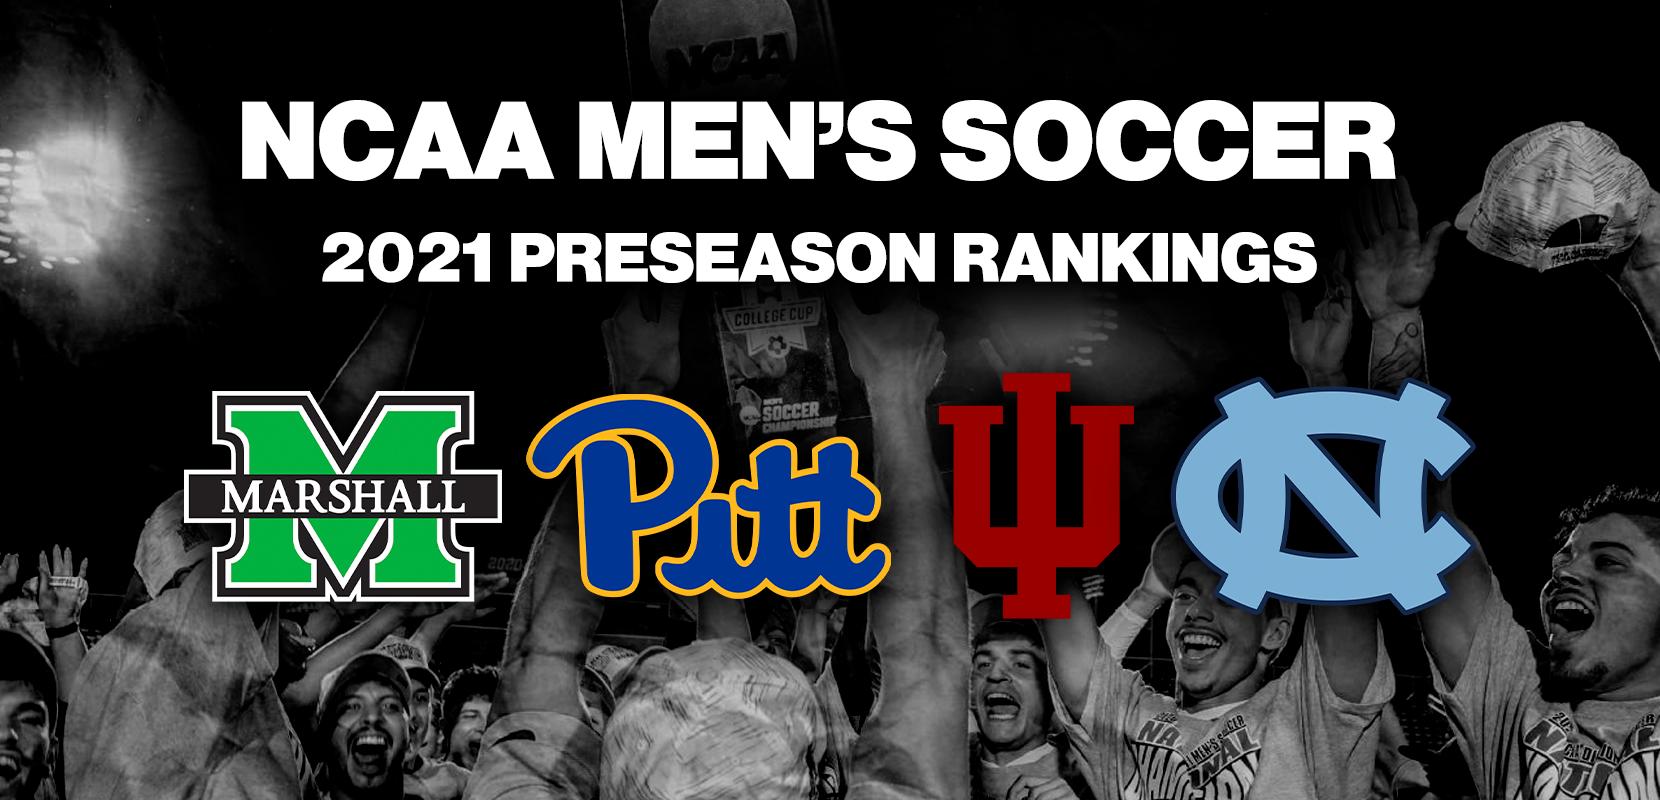 Biggest Takeaways from the Men's College Soccer Preseason Rankings